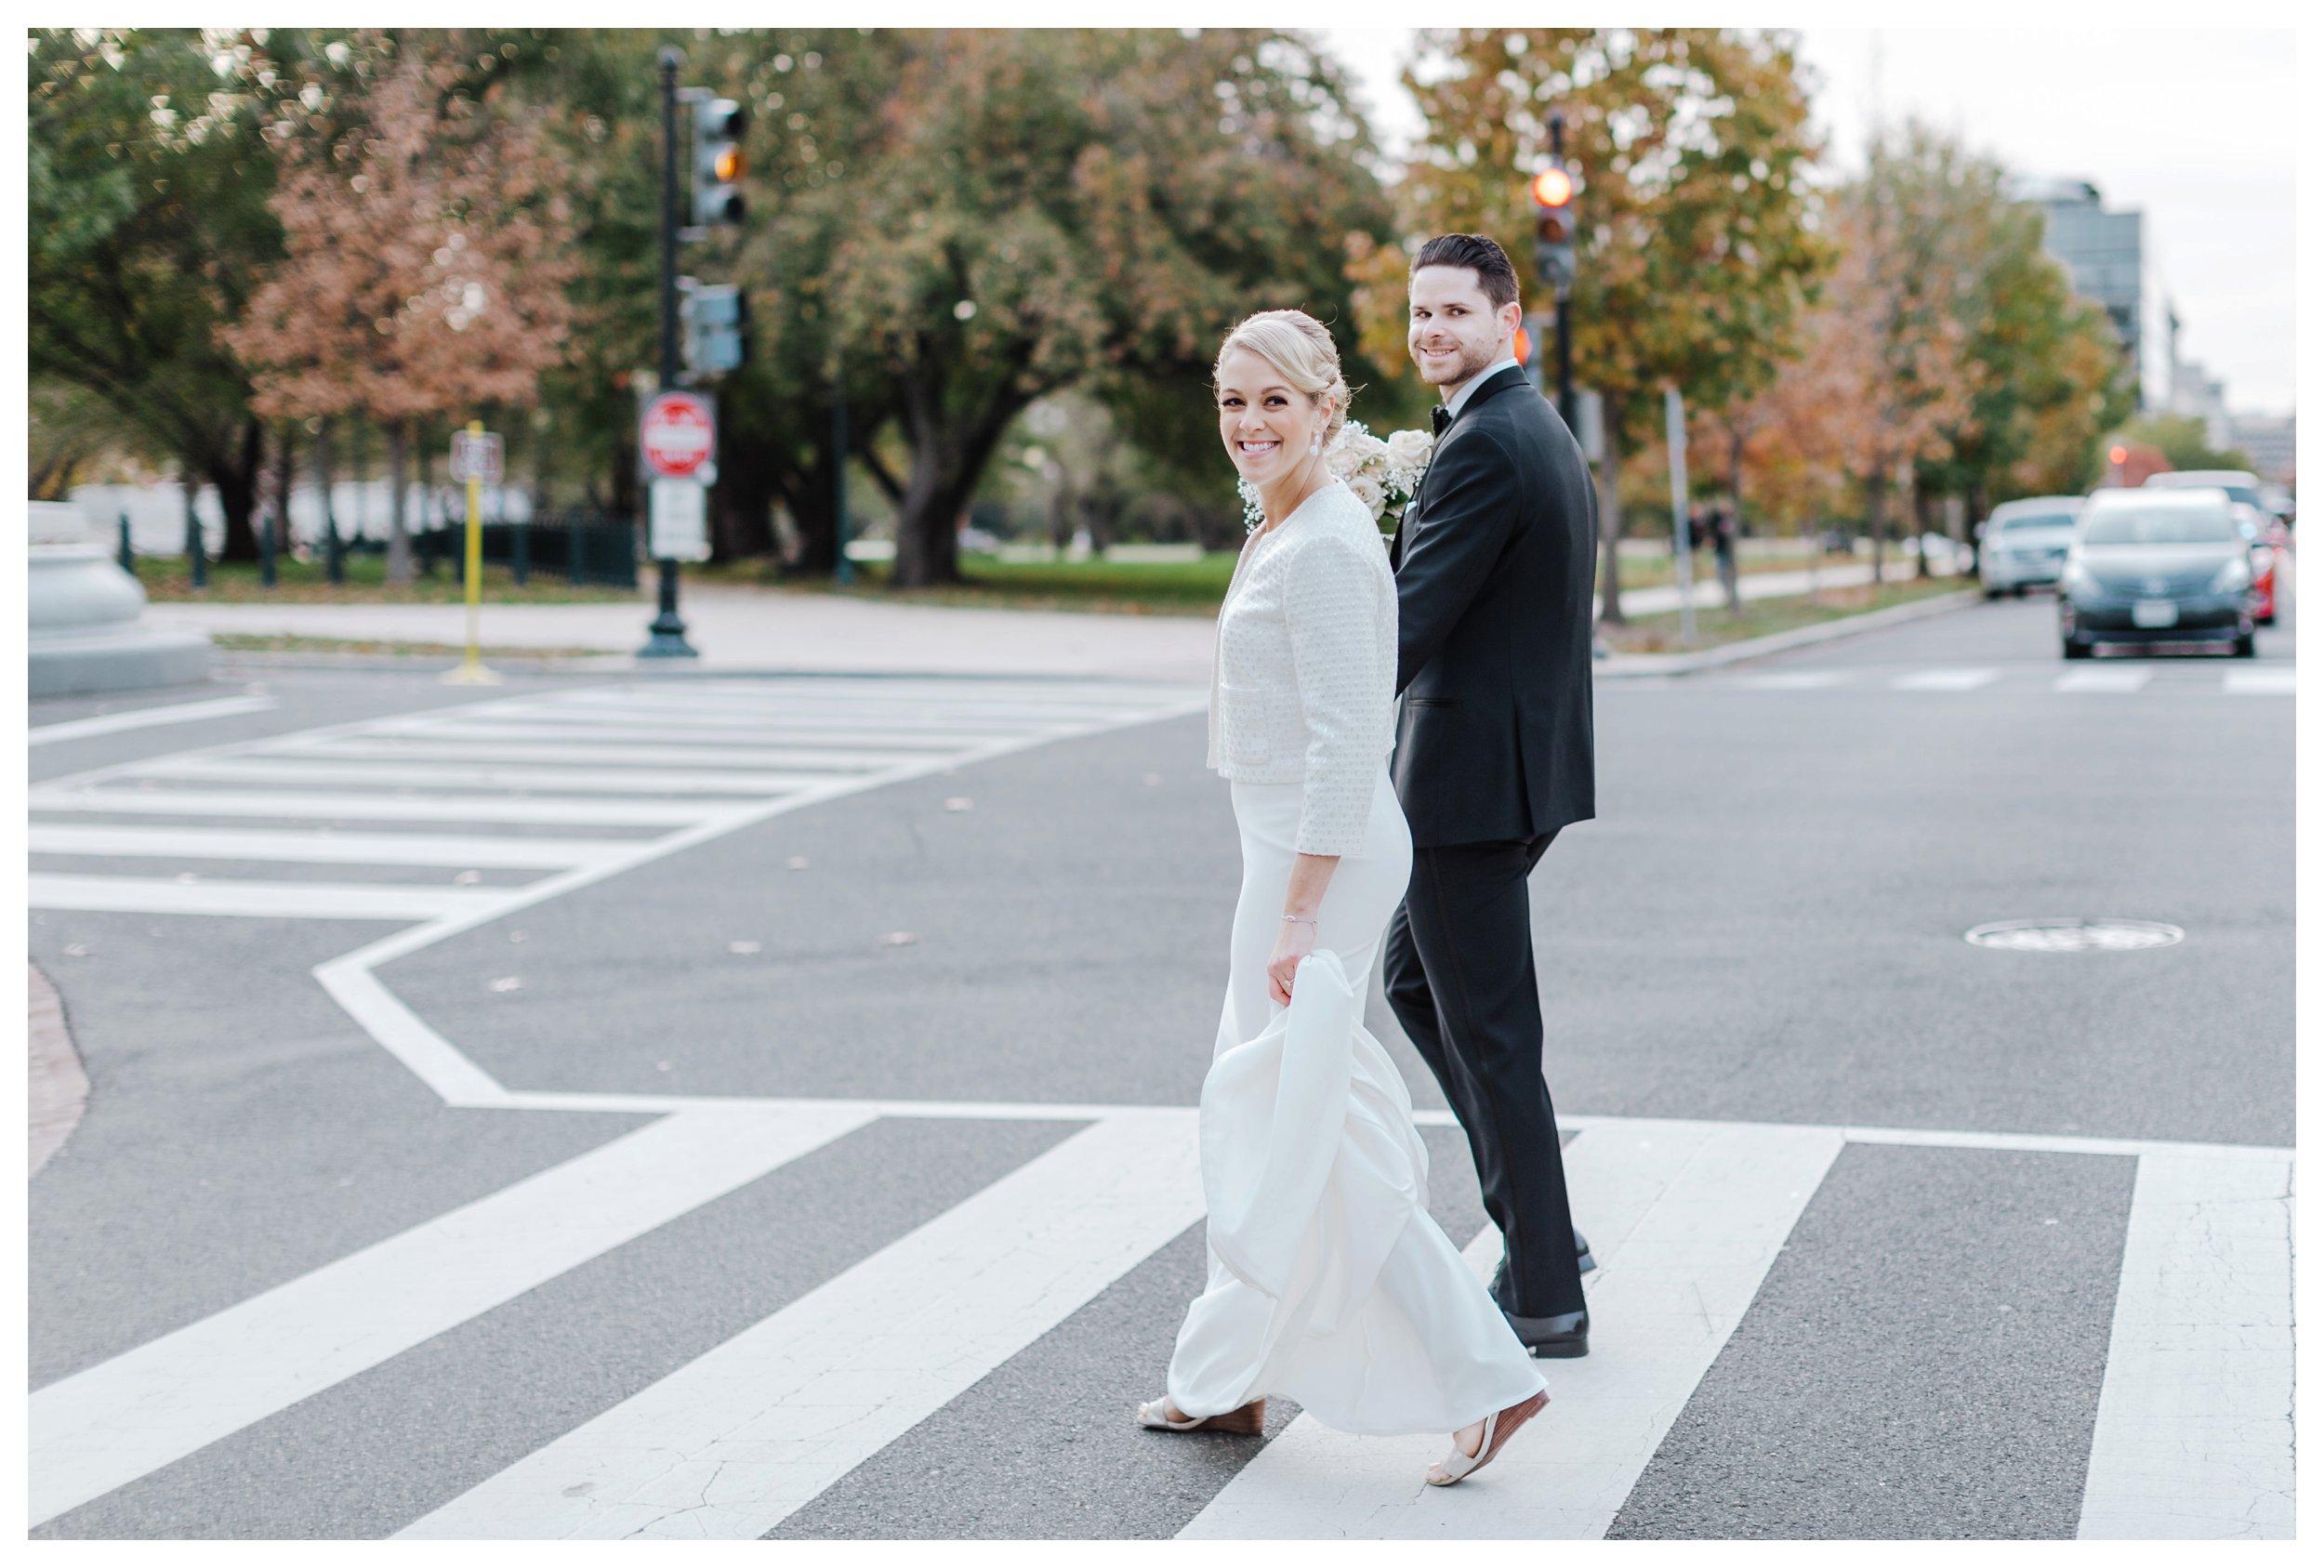 washington-dc-wedding-photographer-28.JPG